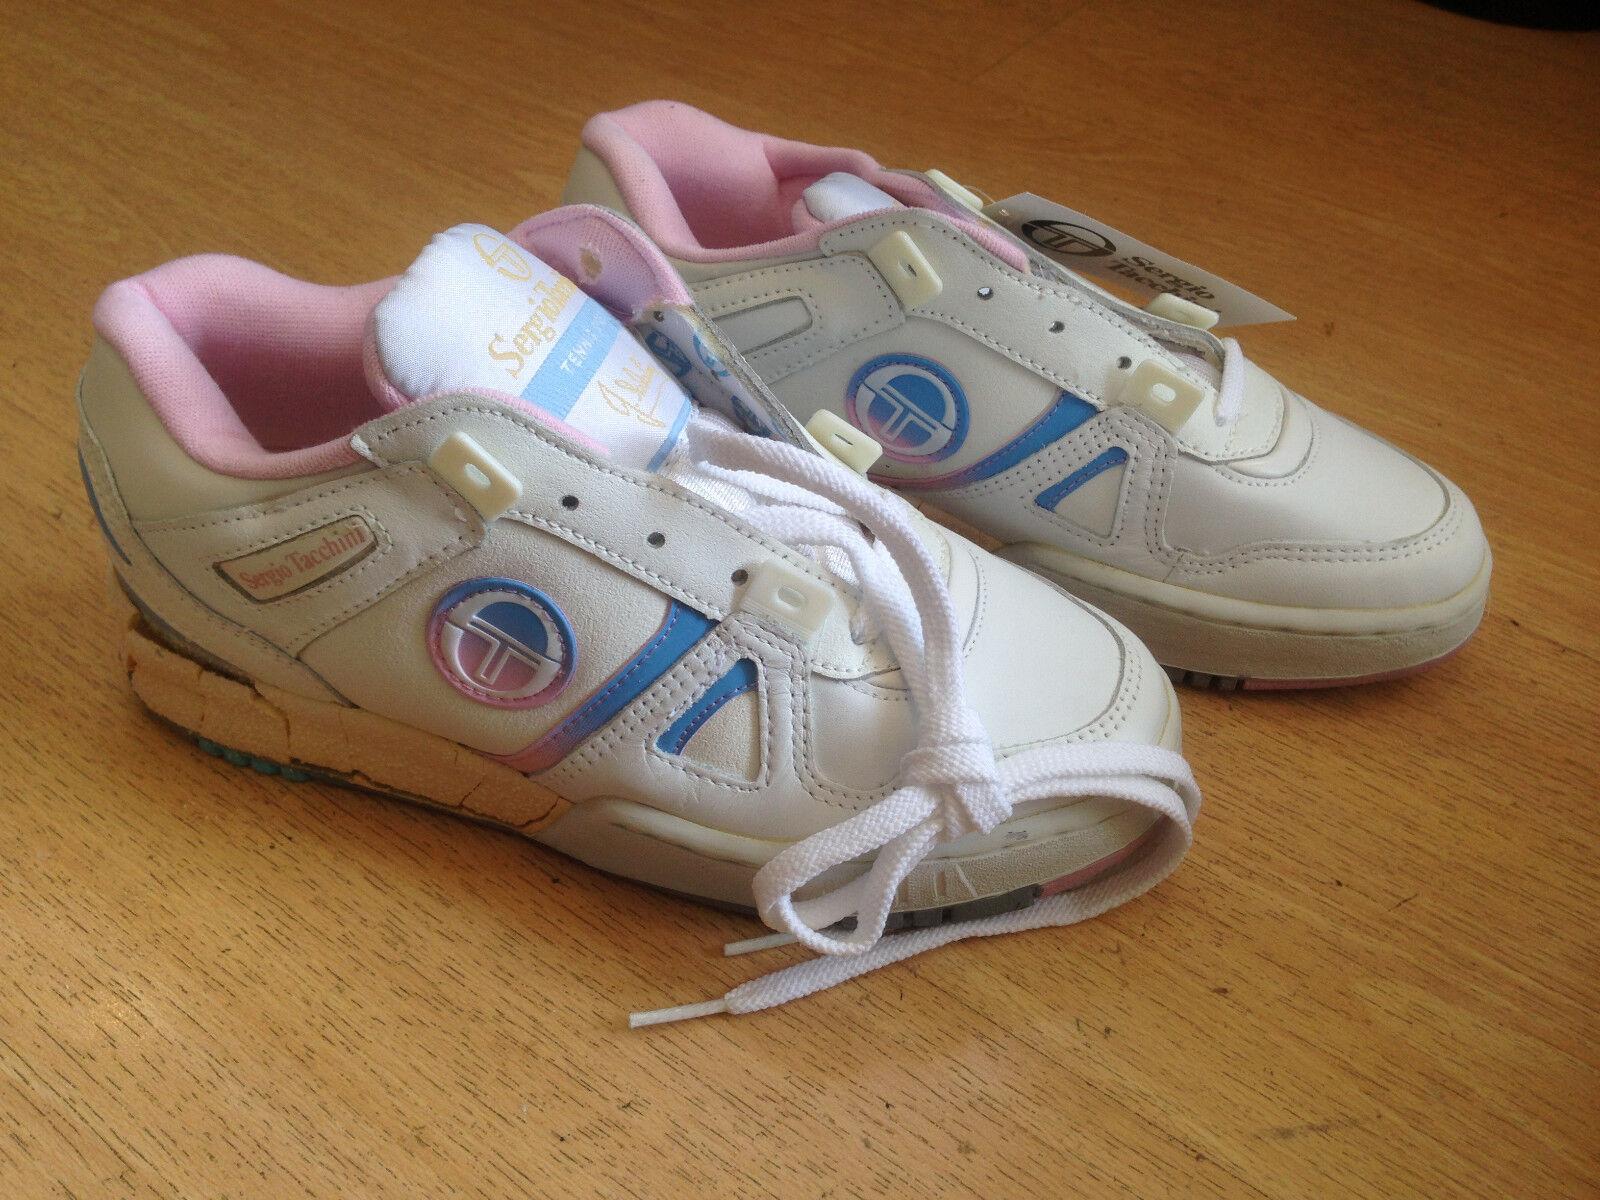 OG 1990s Sergio Tacchini SABATINI OPEN vintage sneakers Größe US5 SUPER RARE